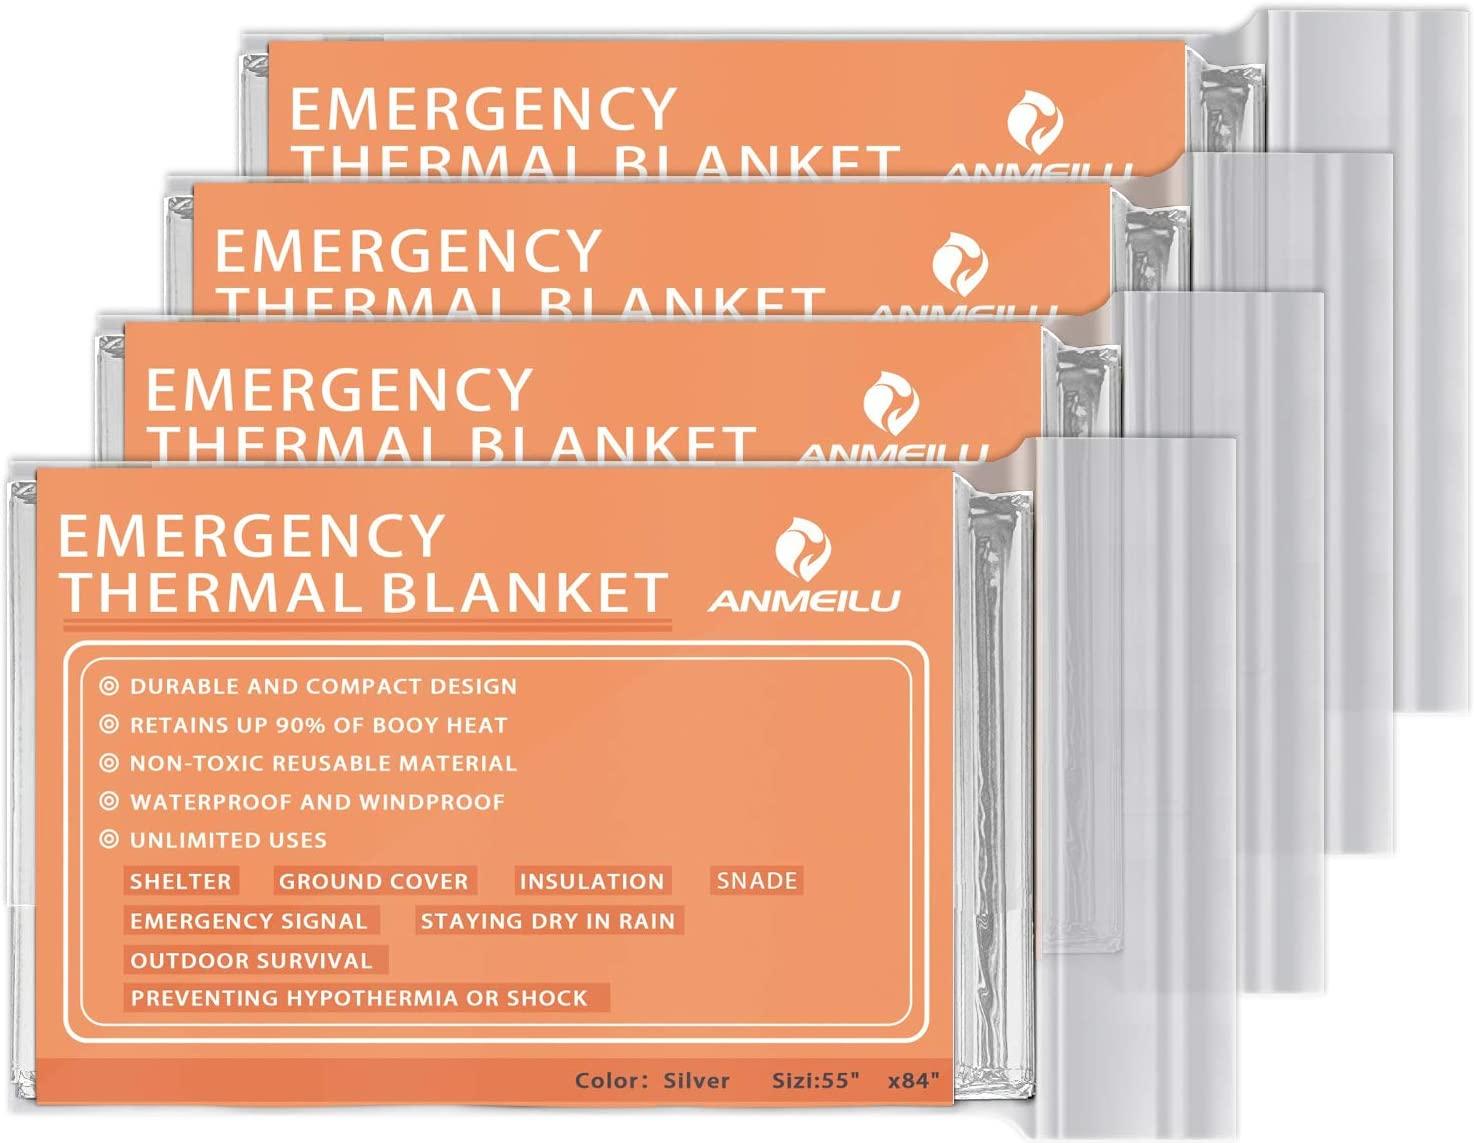 Anmeilu Emergency Mylar Thermal Blanket